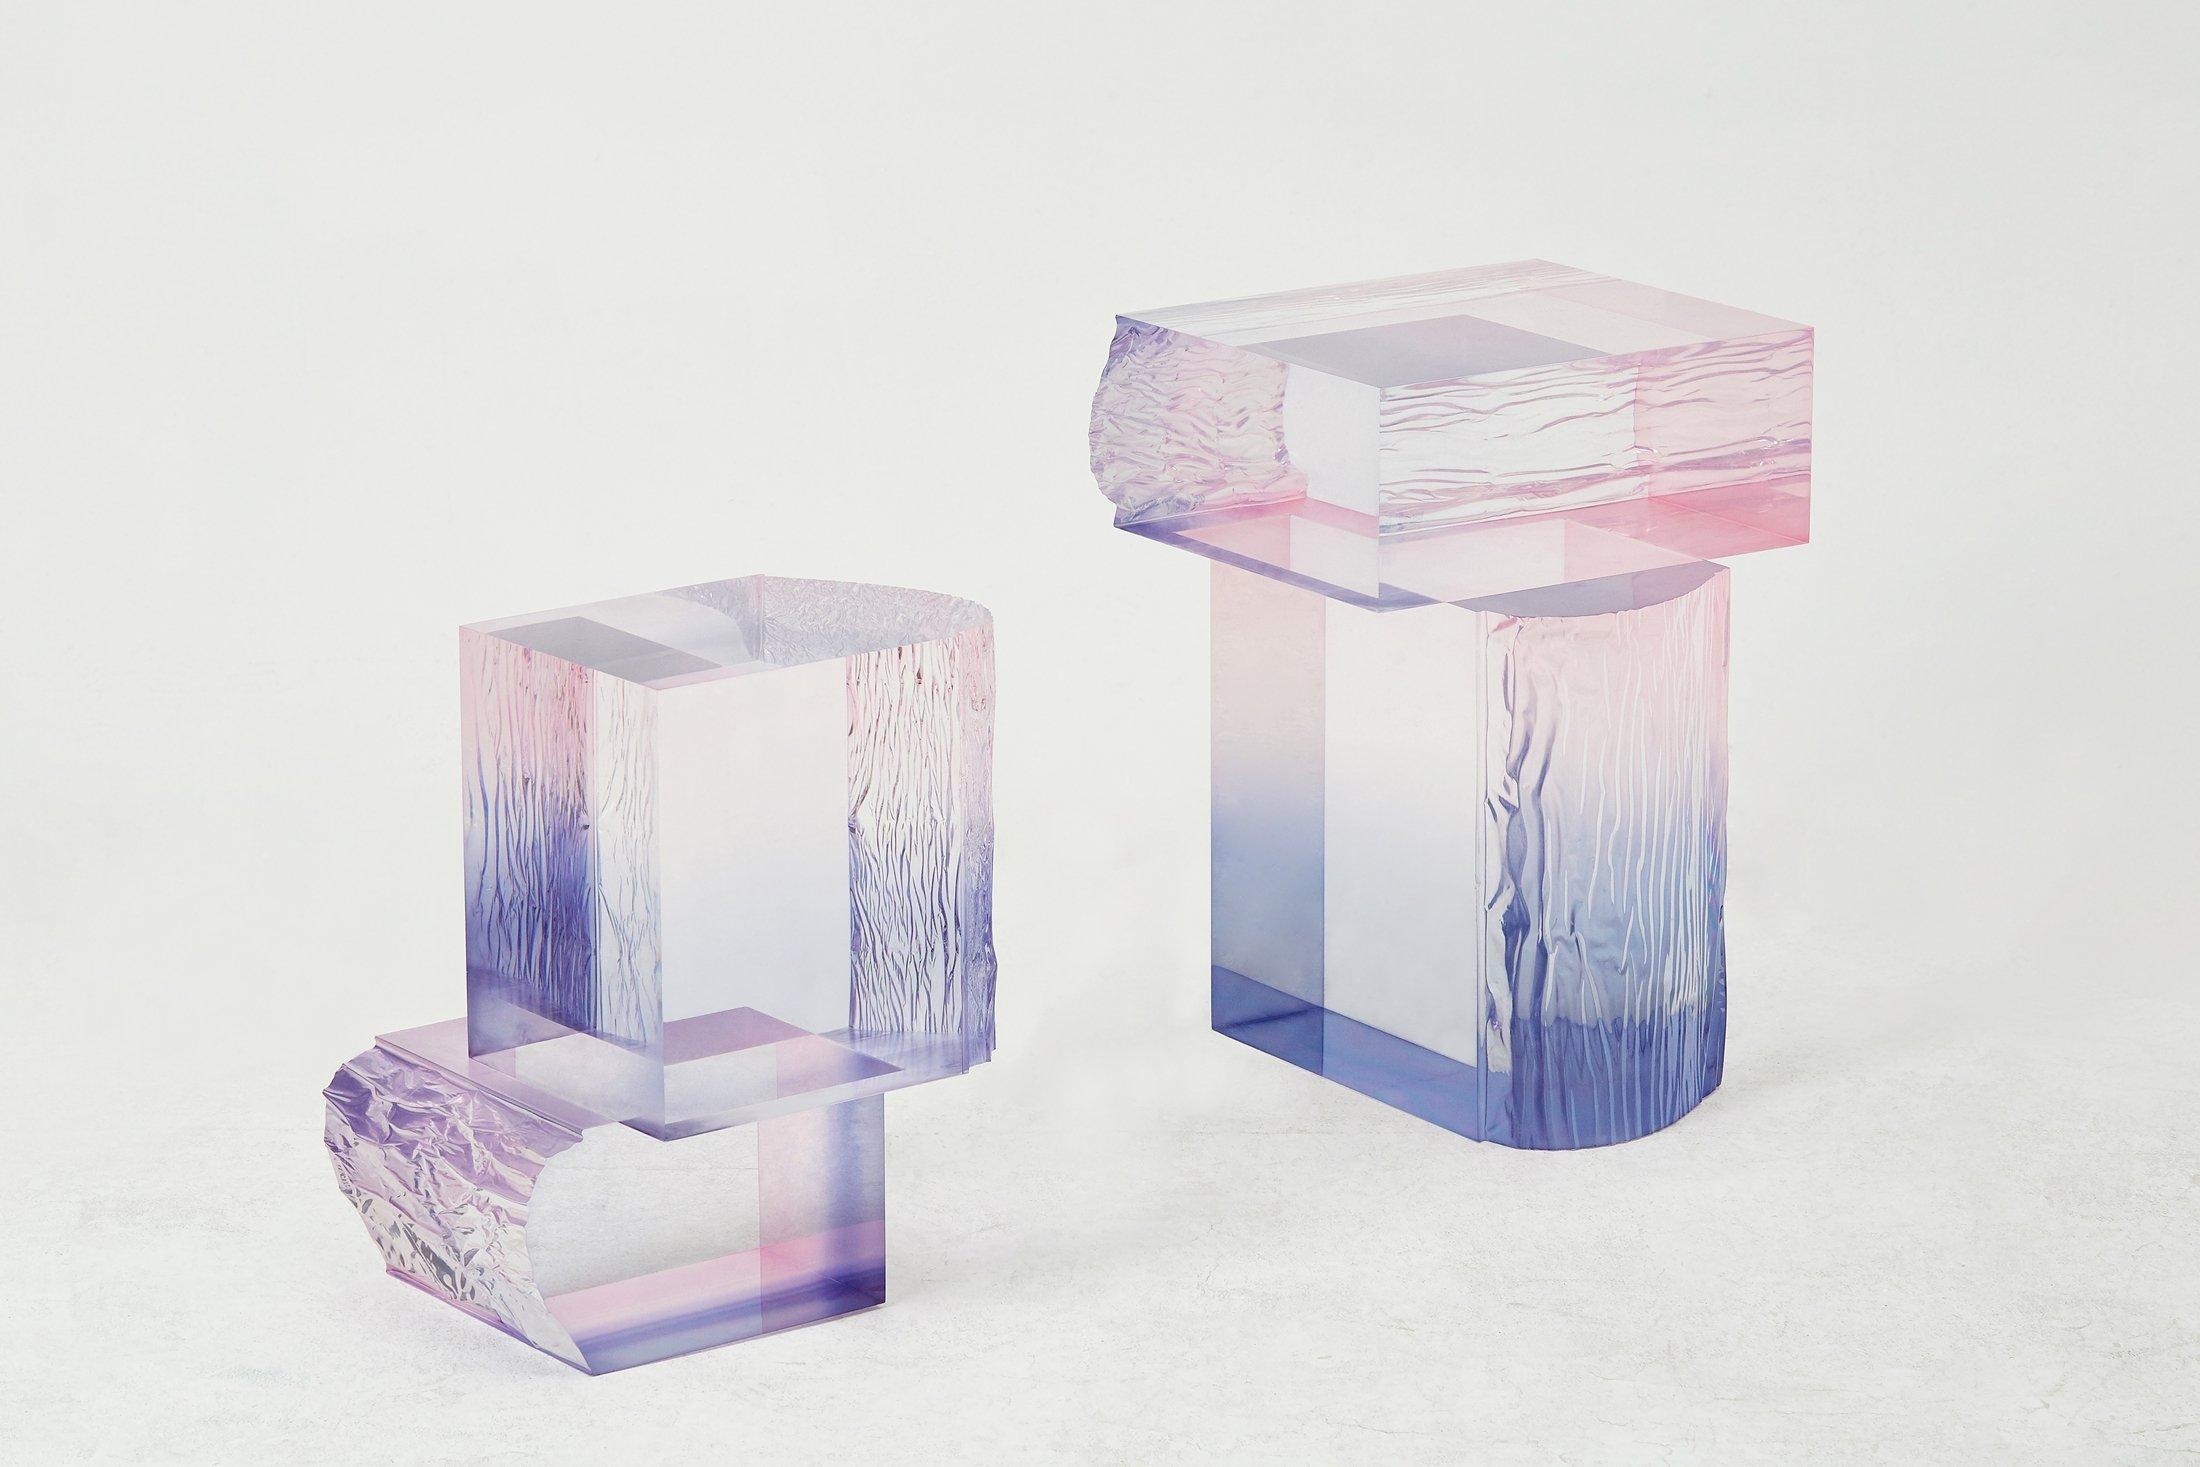 Crystal Series By Saerom Yoon